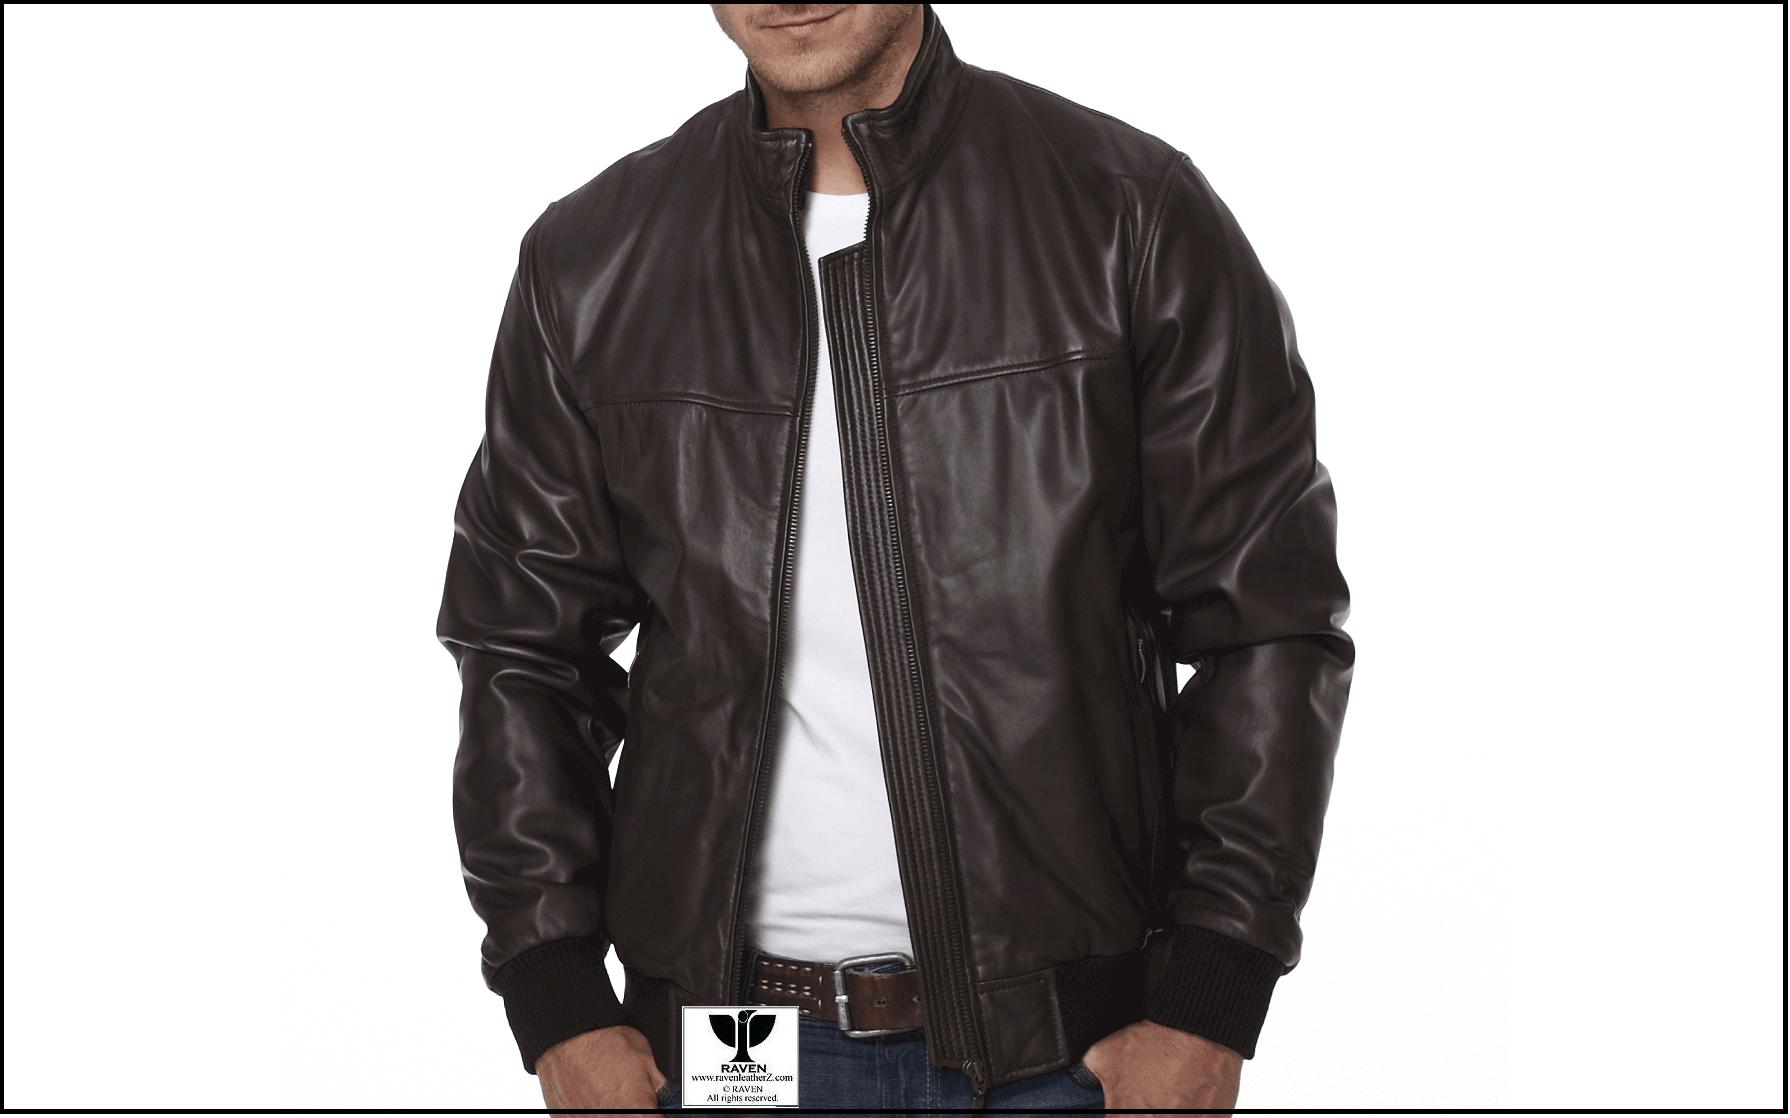 Types of Jacket in Bd: Men's Genuine Leather Bomber Jacket